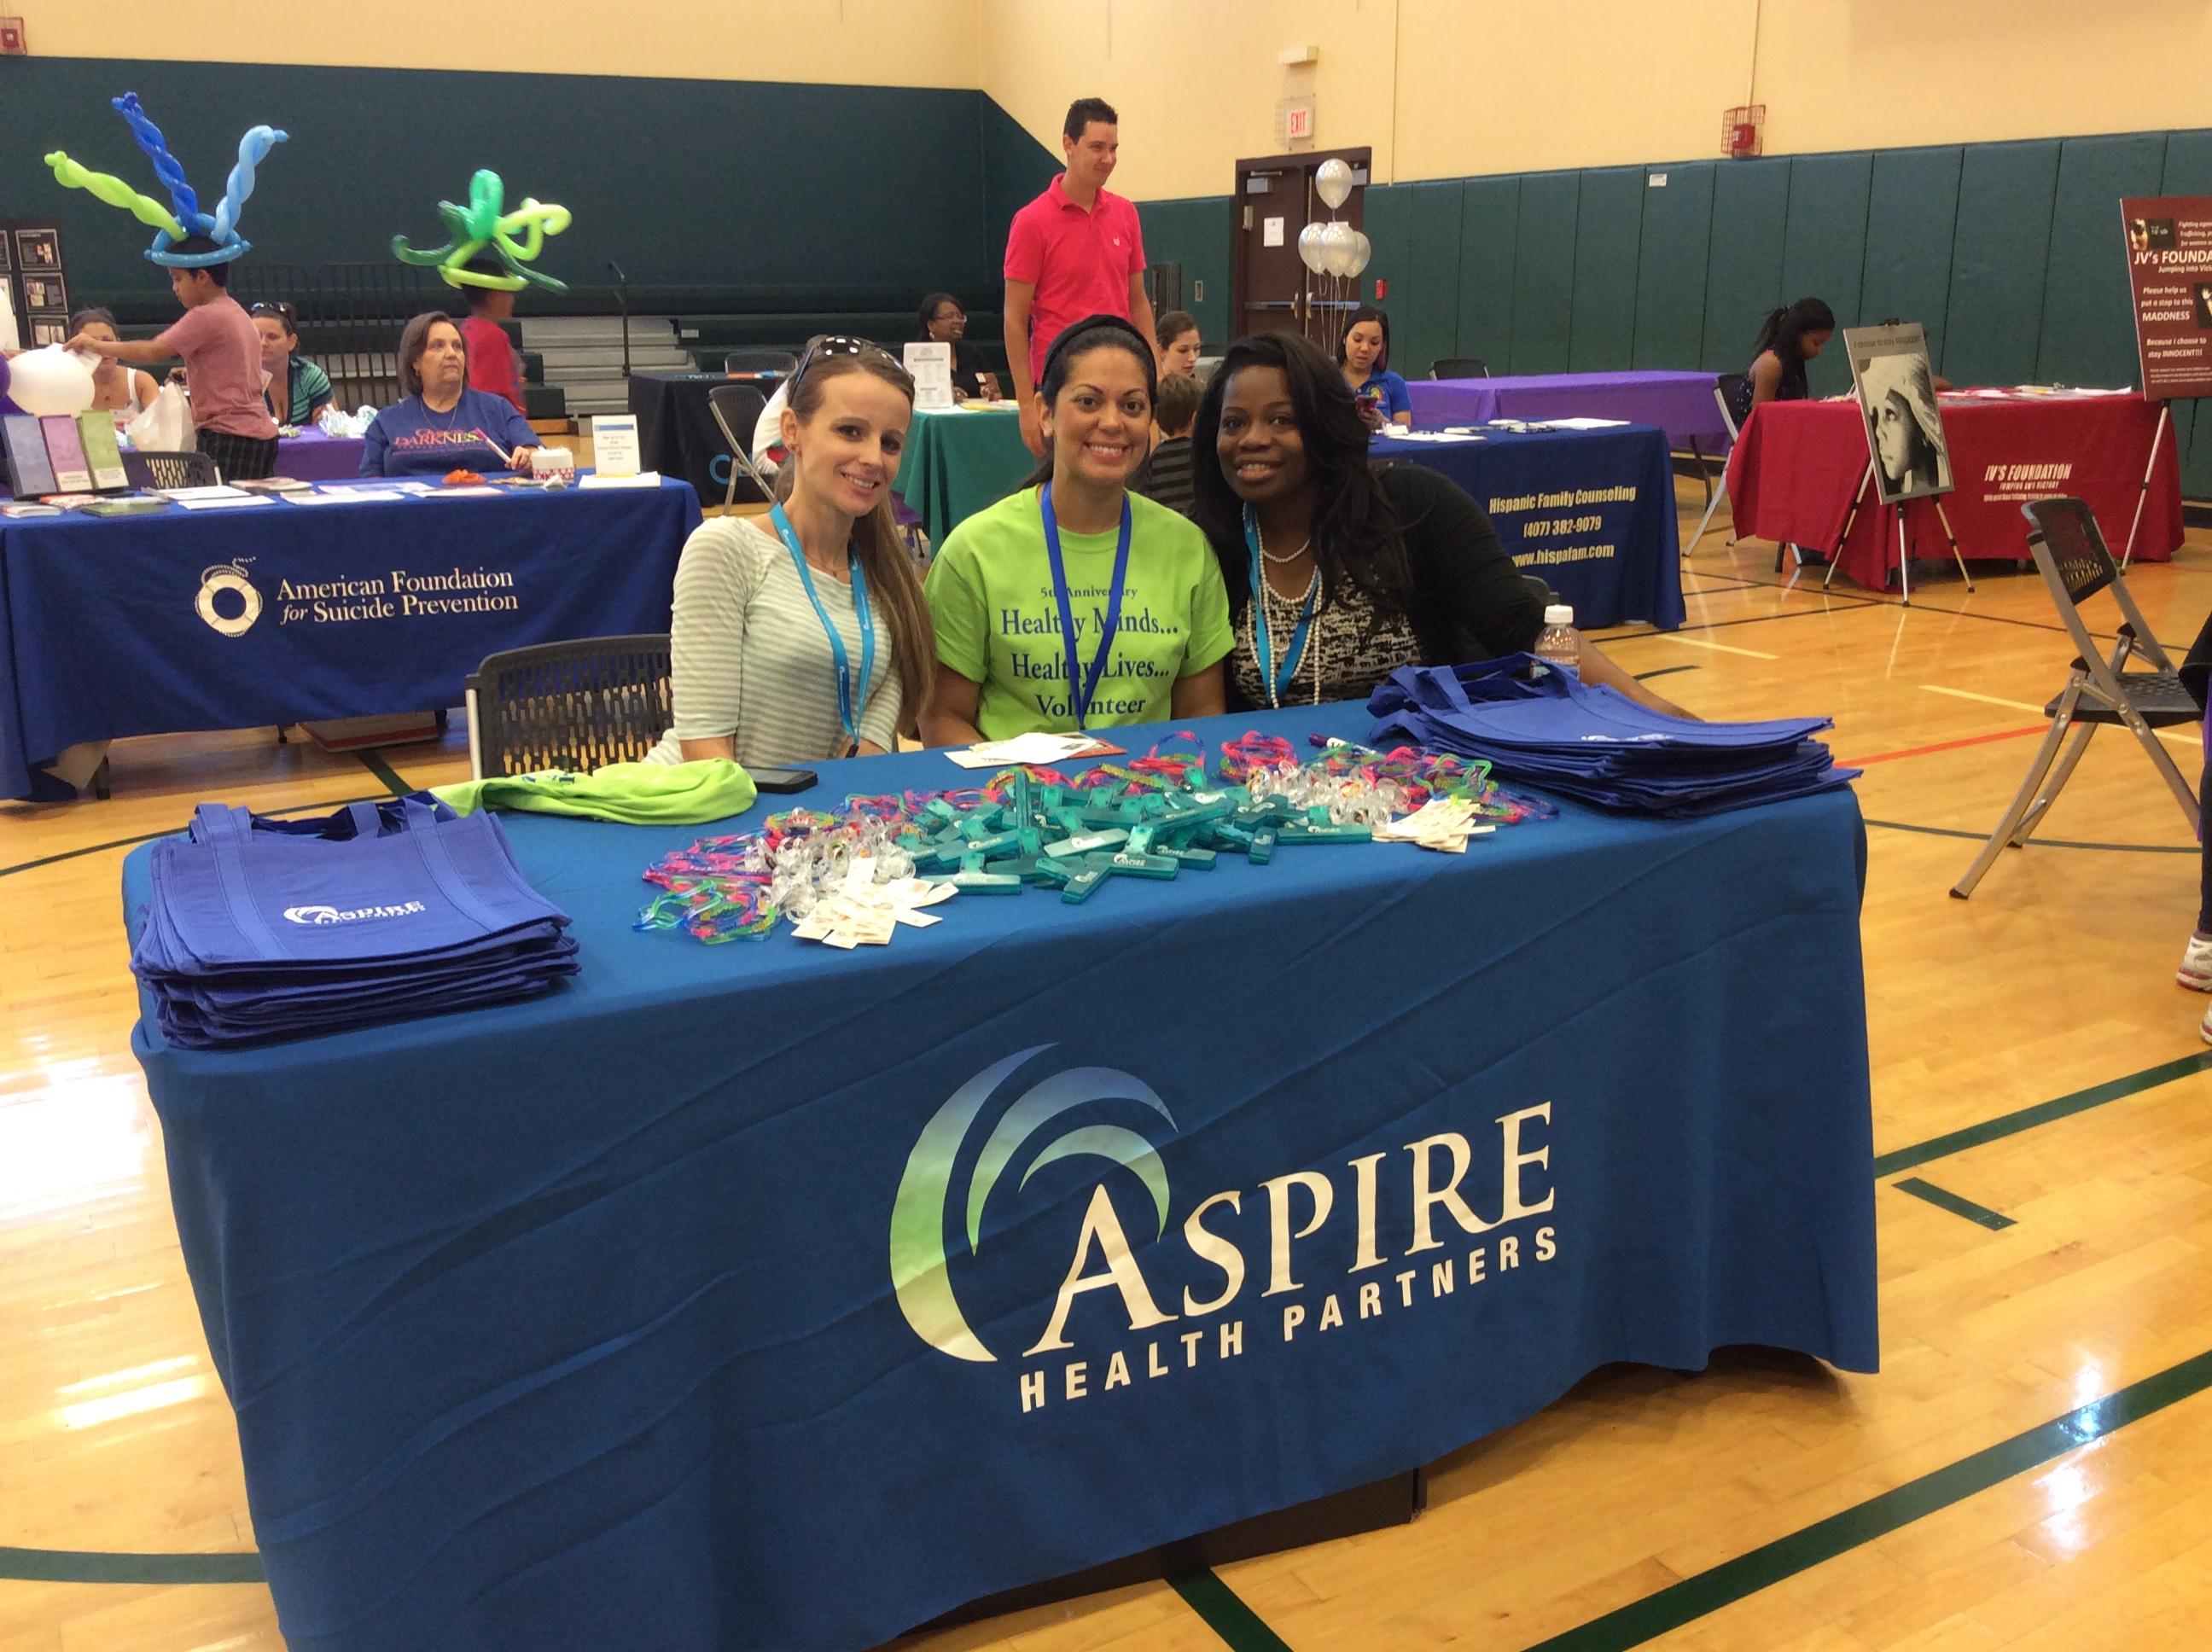 Aspire Health Partners